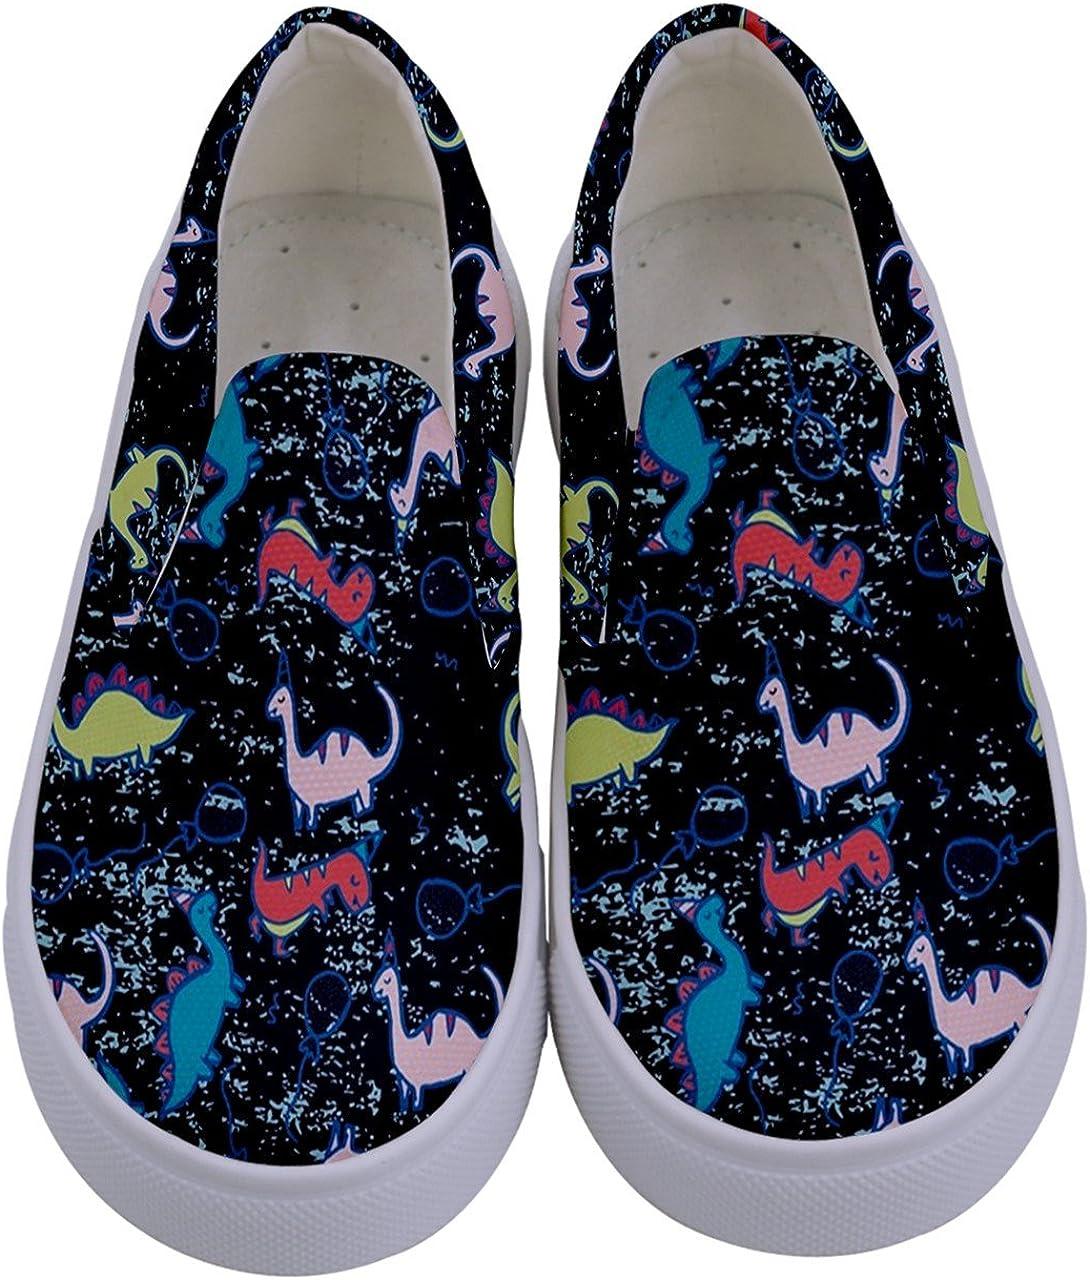 Kids Canvas Slip-on Shoes Size:US8C-7Y